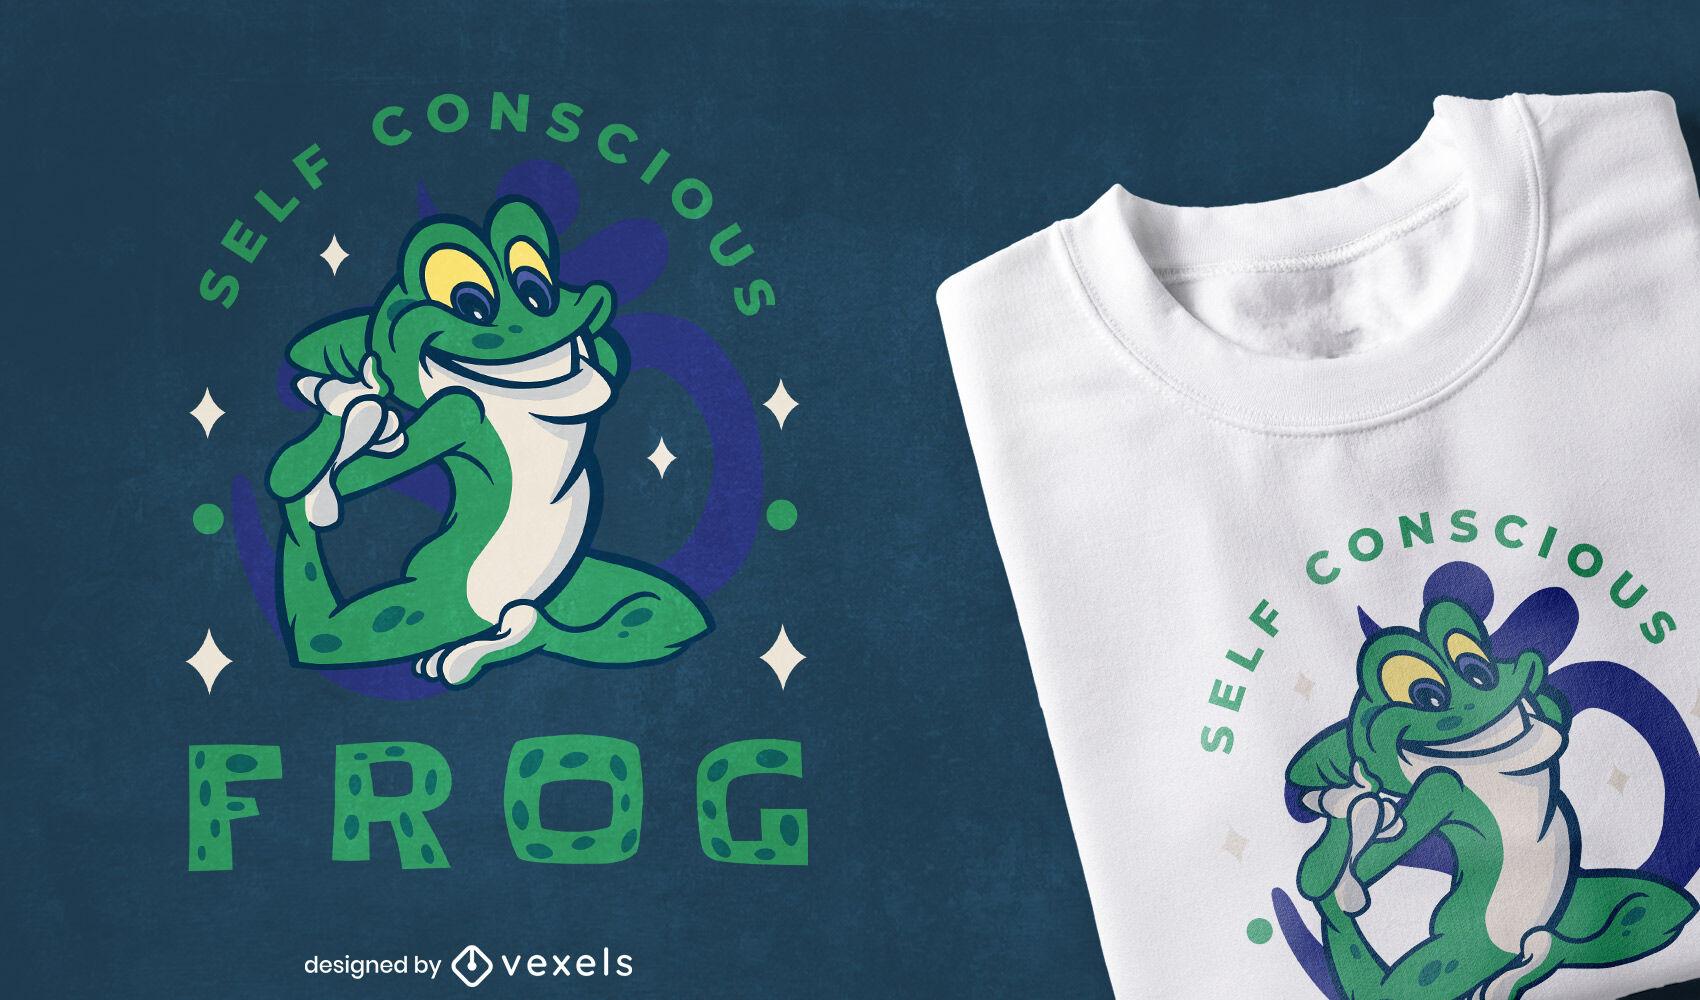 Froschtier Yoga Pose T-Shirt Design